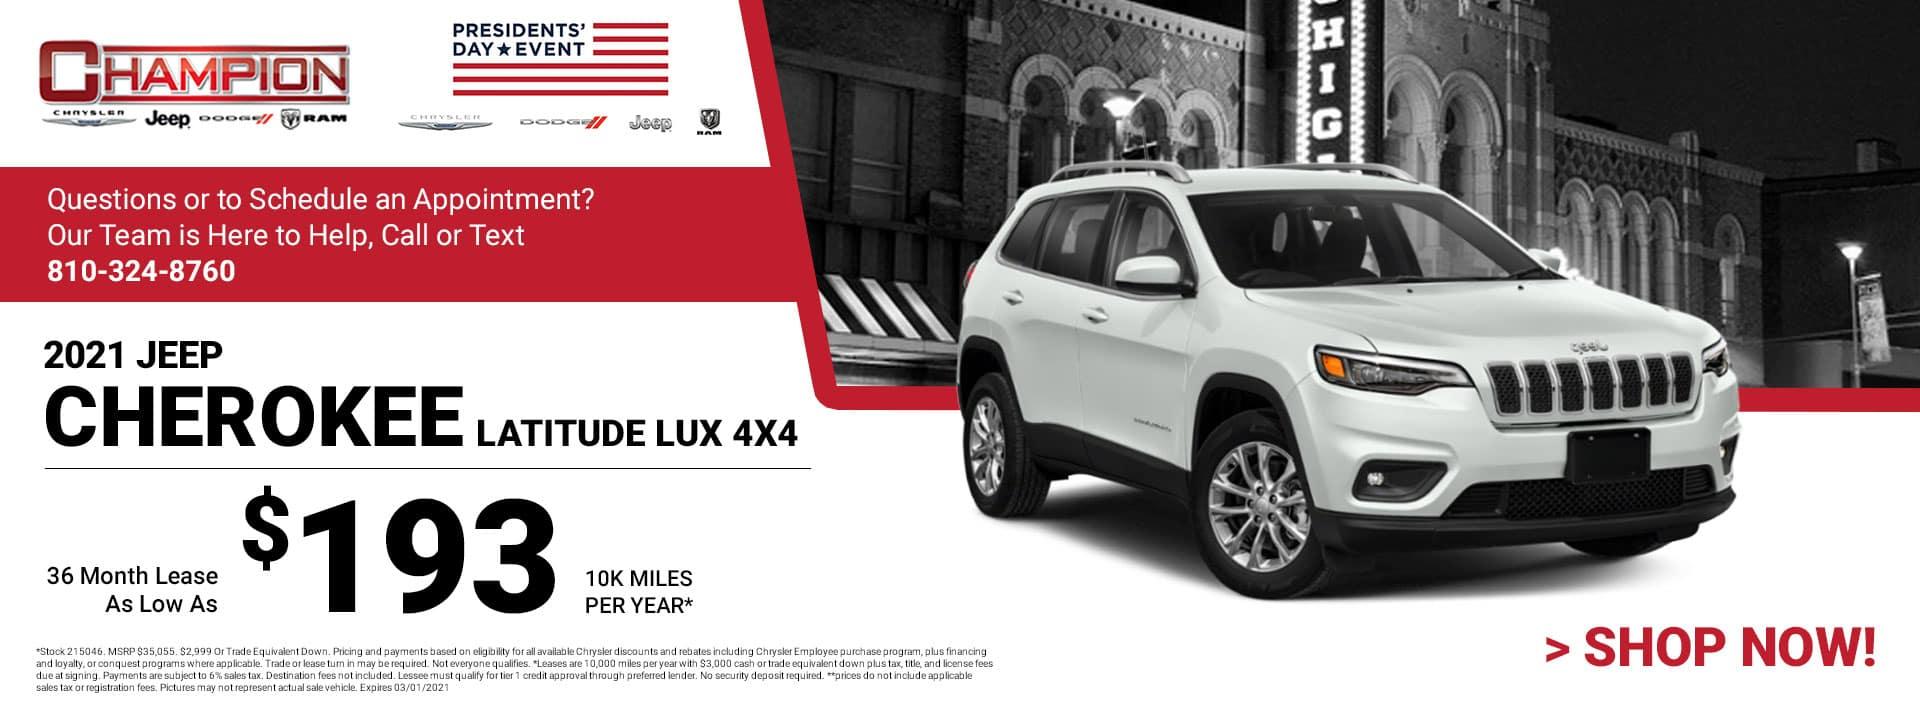 2021 Jeep Cherokee Latitude 4x4 - Lease